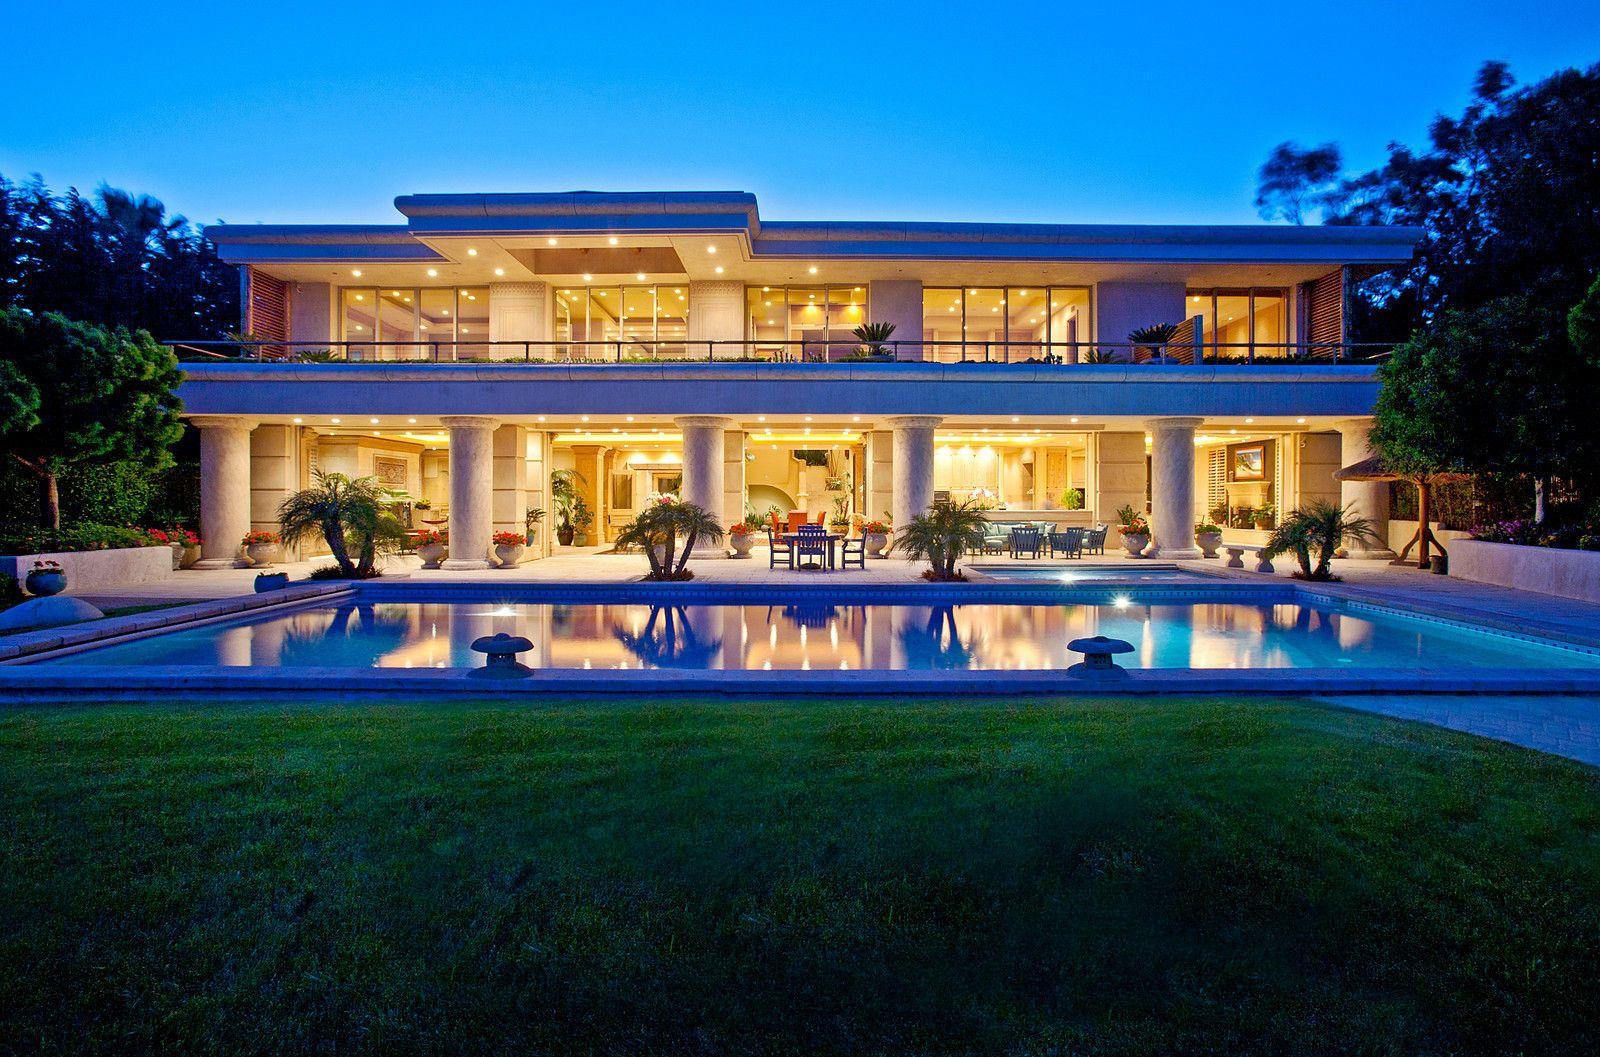 malibu real estate agent luxury beach homes in malibu chris cortazzo dream homes pinterest. Black Bedroom Furniture Sets. Home Design Ideas